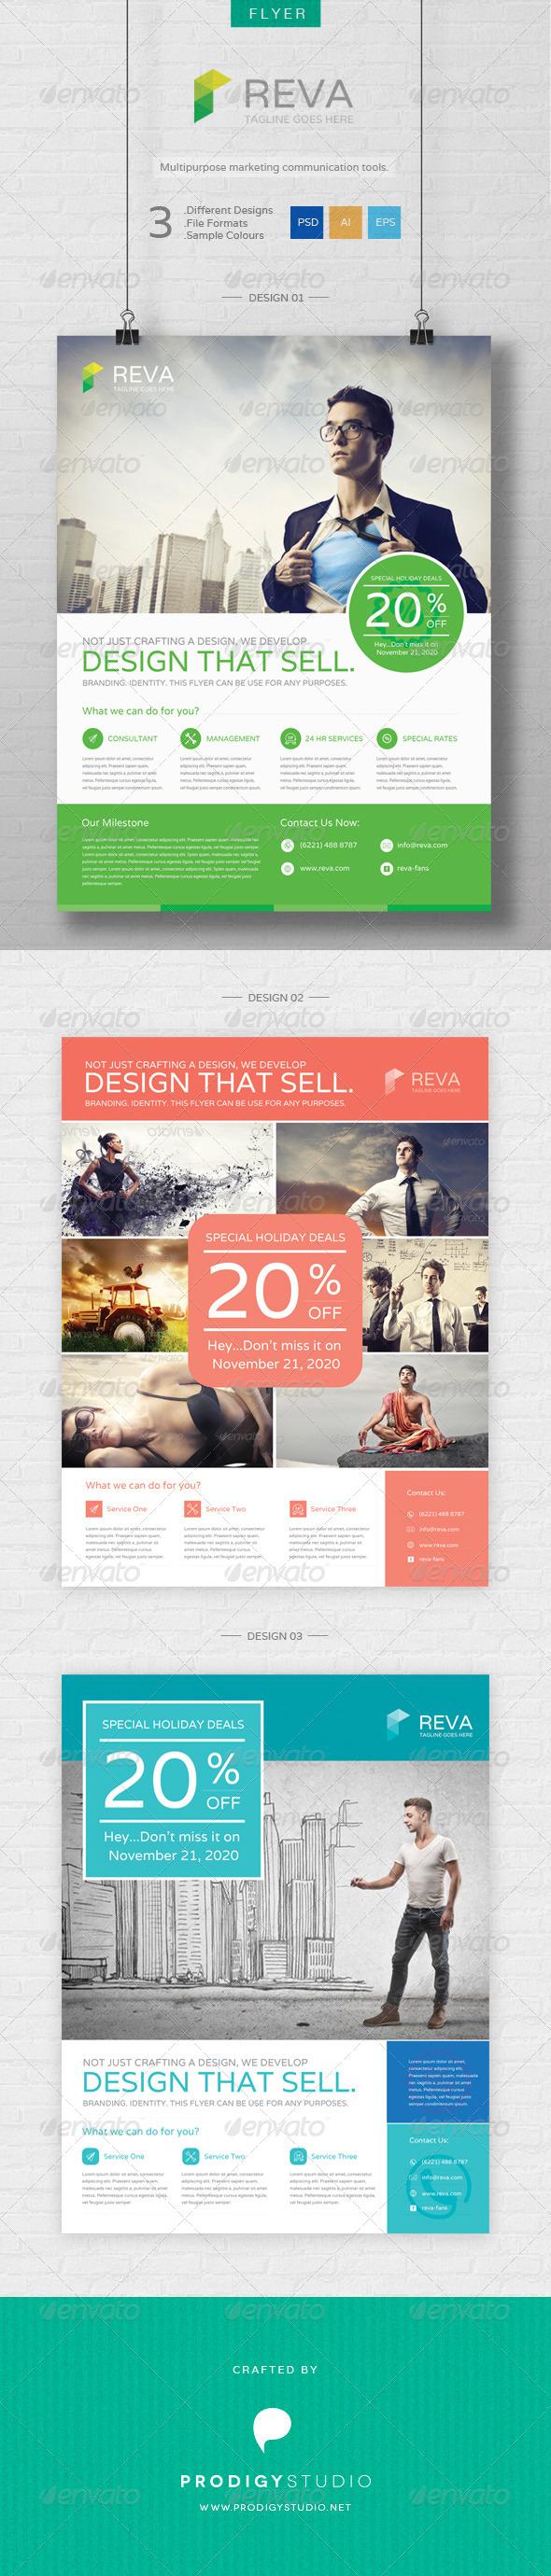 GraphicRiver Reva Flyer Template 6763140